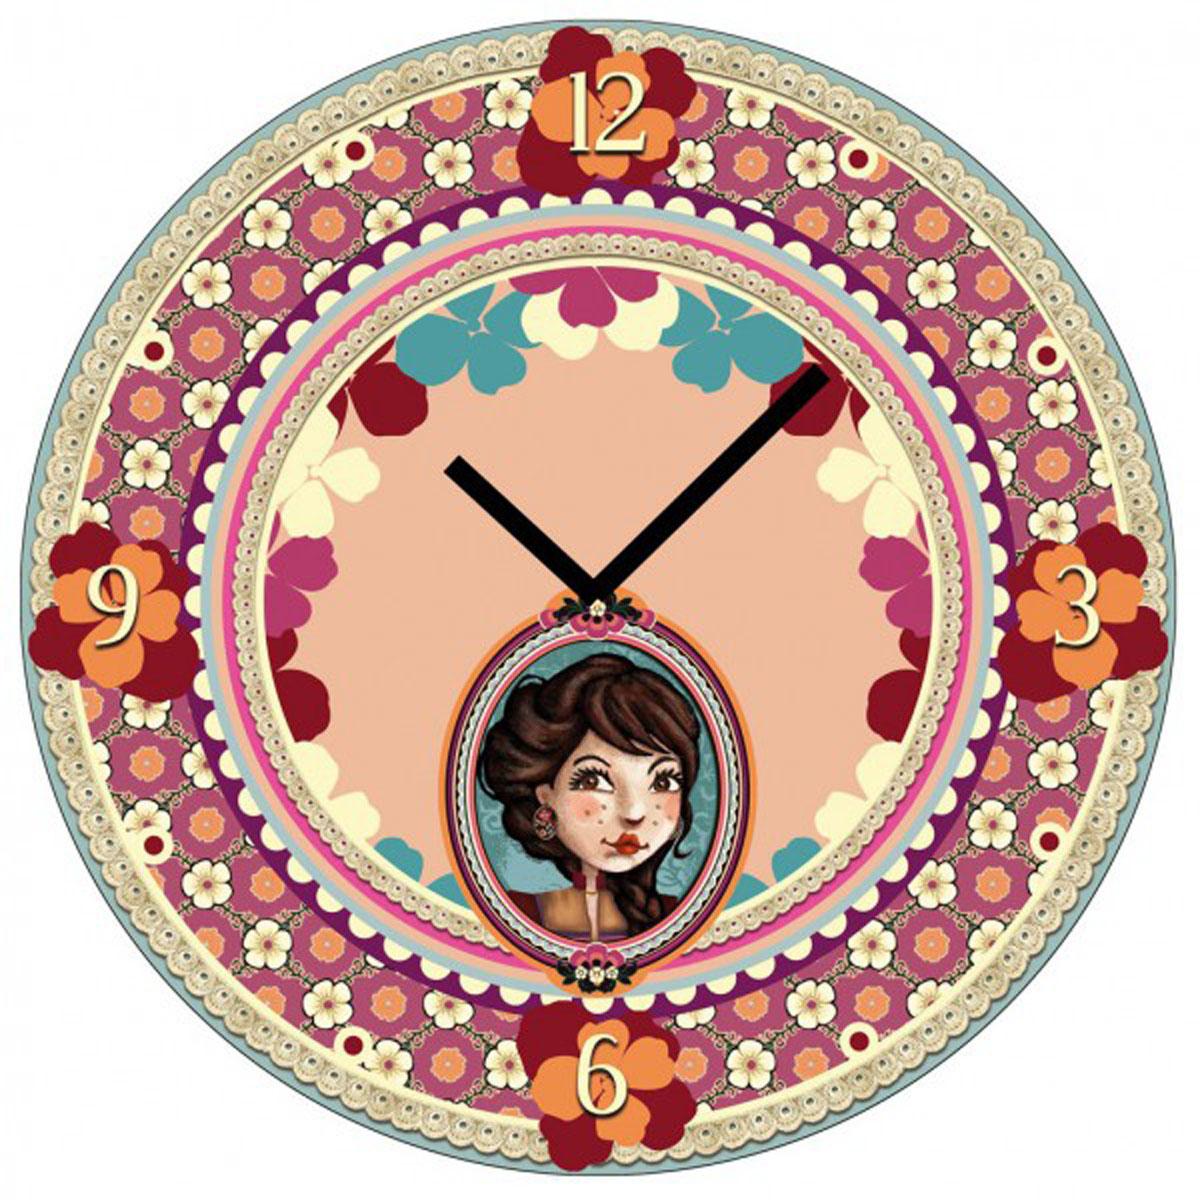 Horloge Murale verre \'Lili Petrol\' beige rose (Emily) - 30 cm - [M3369]